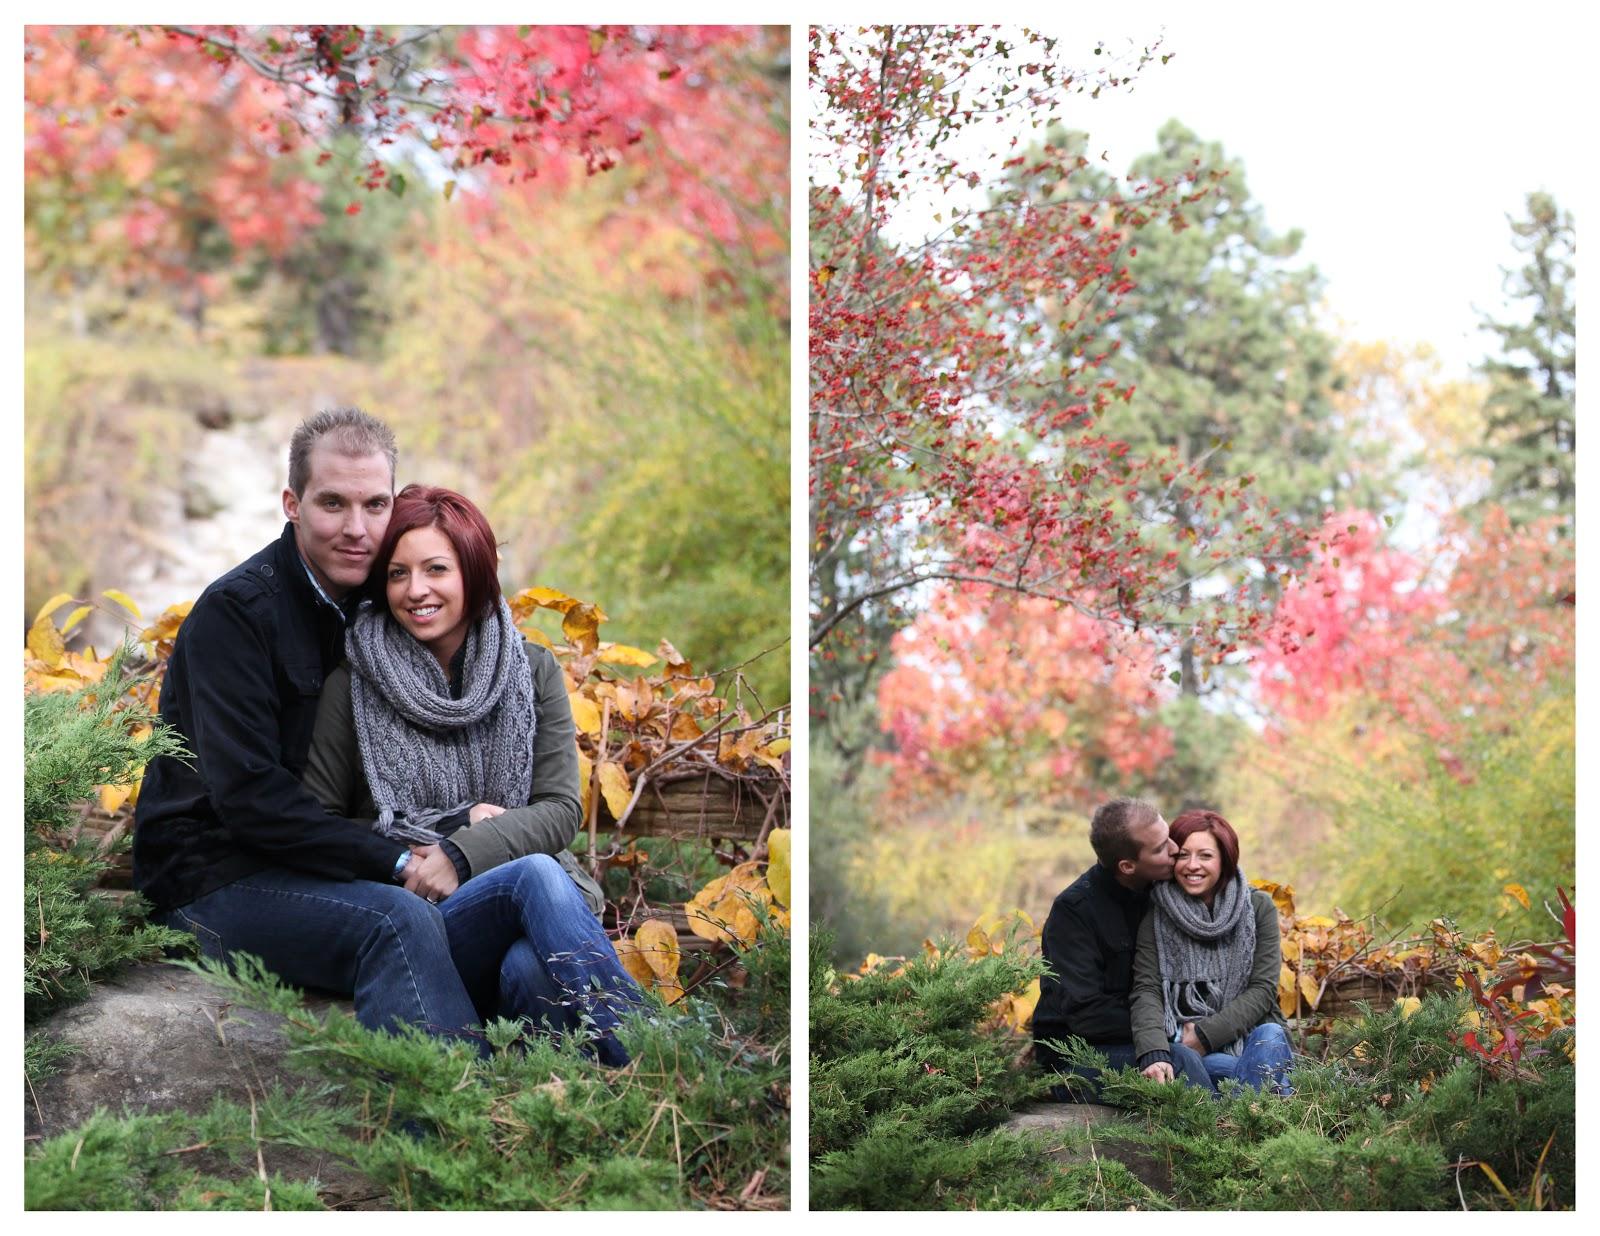 Angela DeVries Photography: Andrew & Megan's Engagement Session!